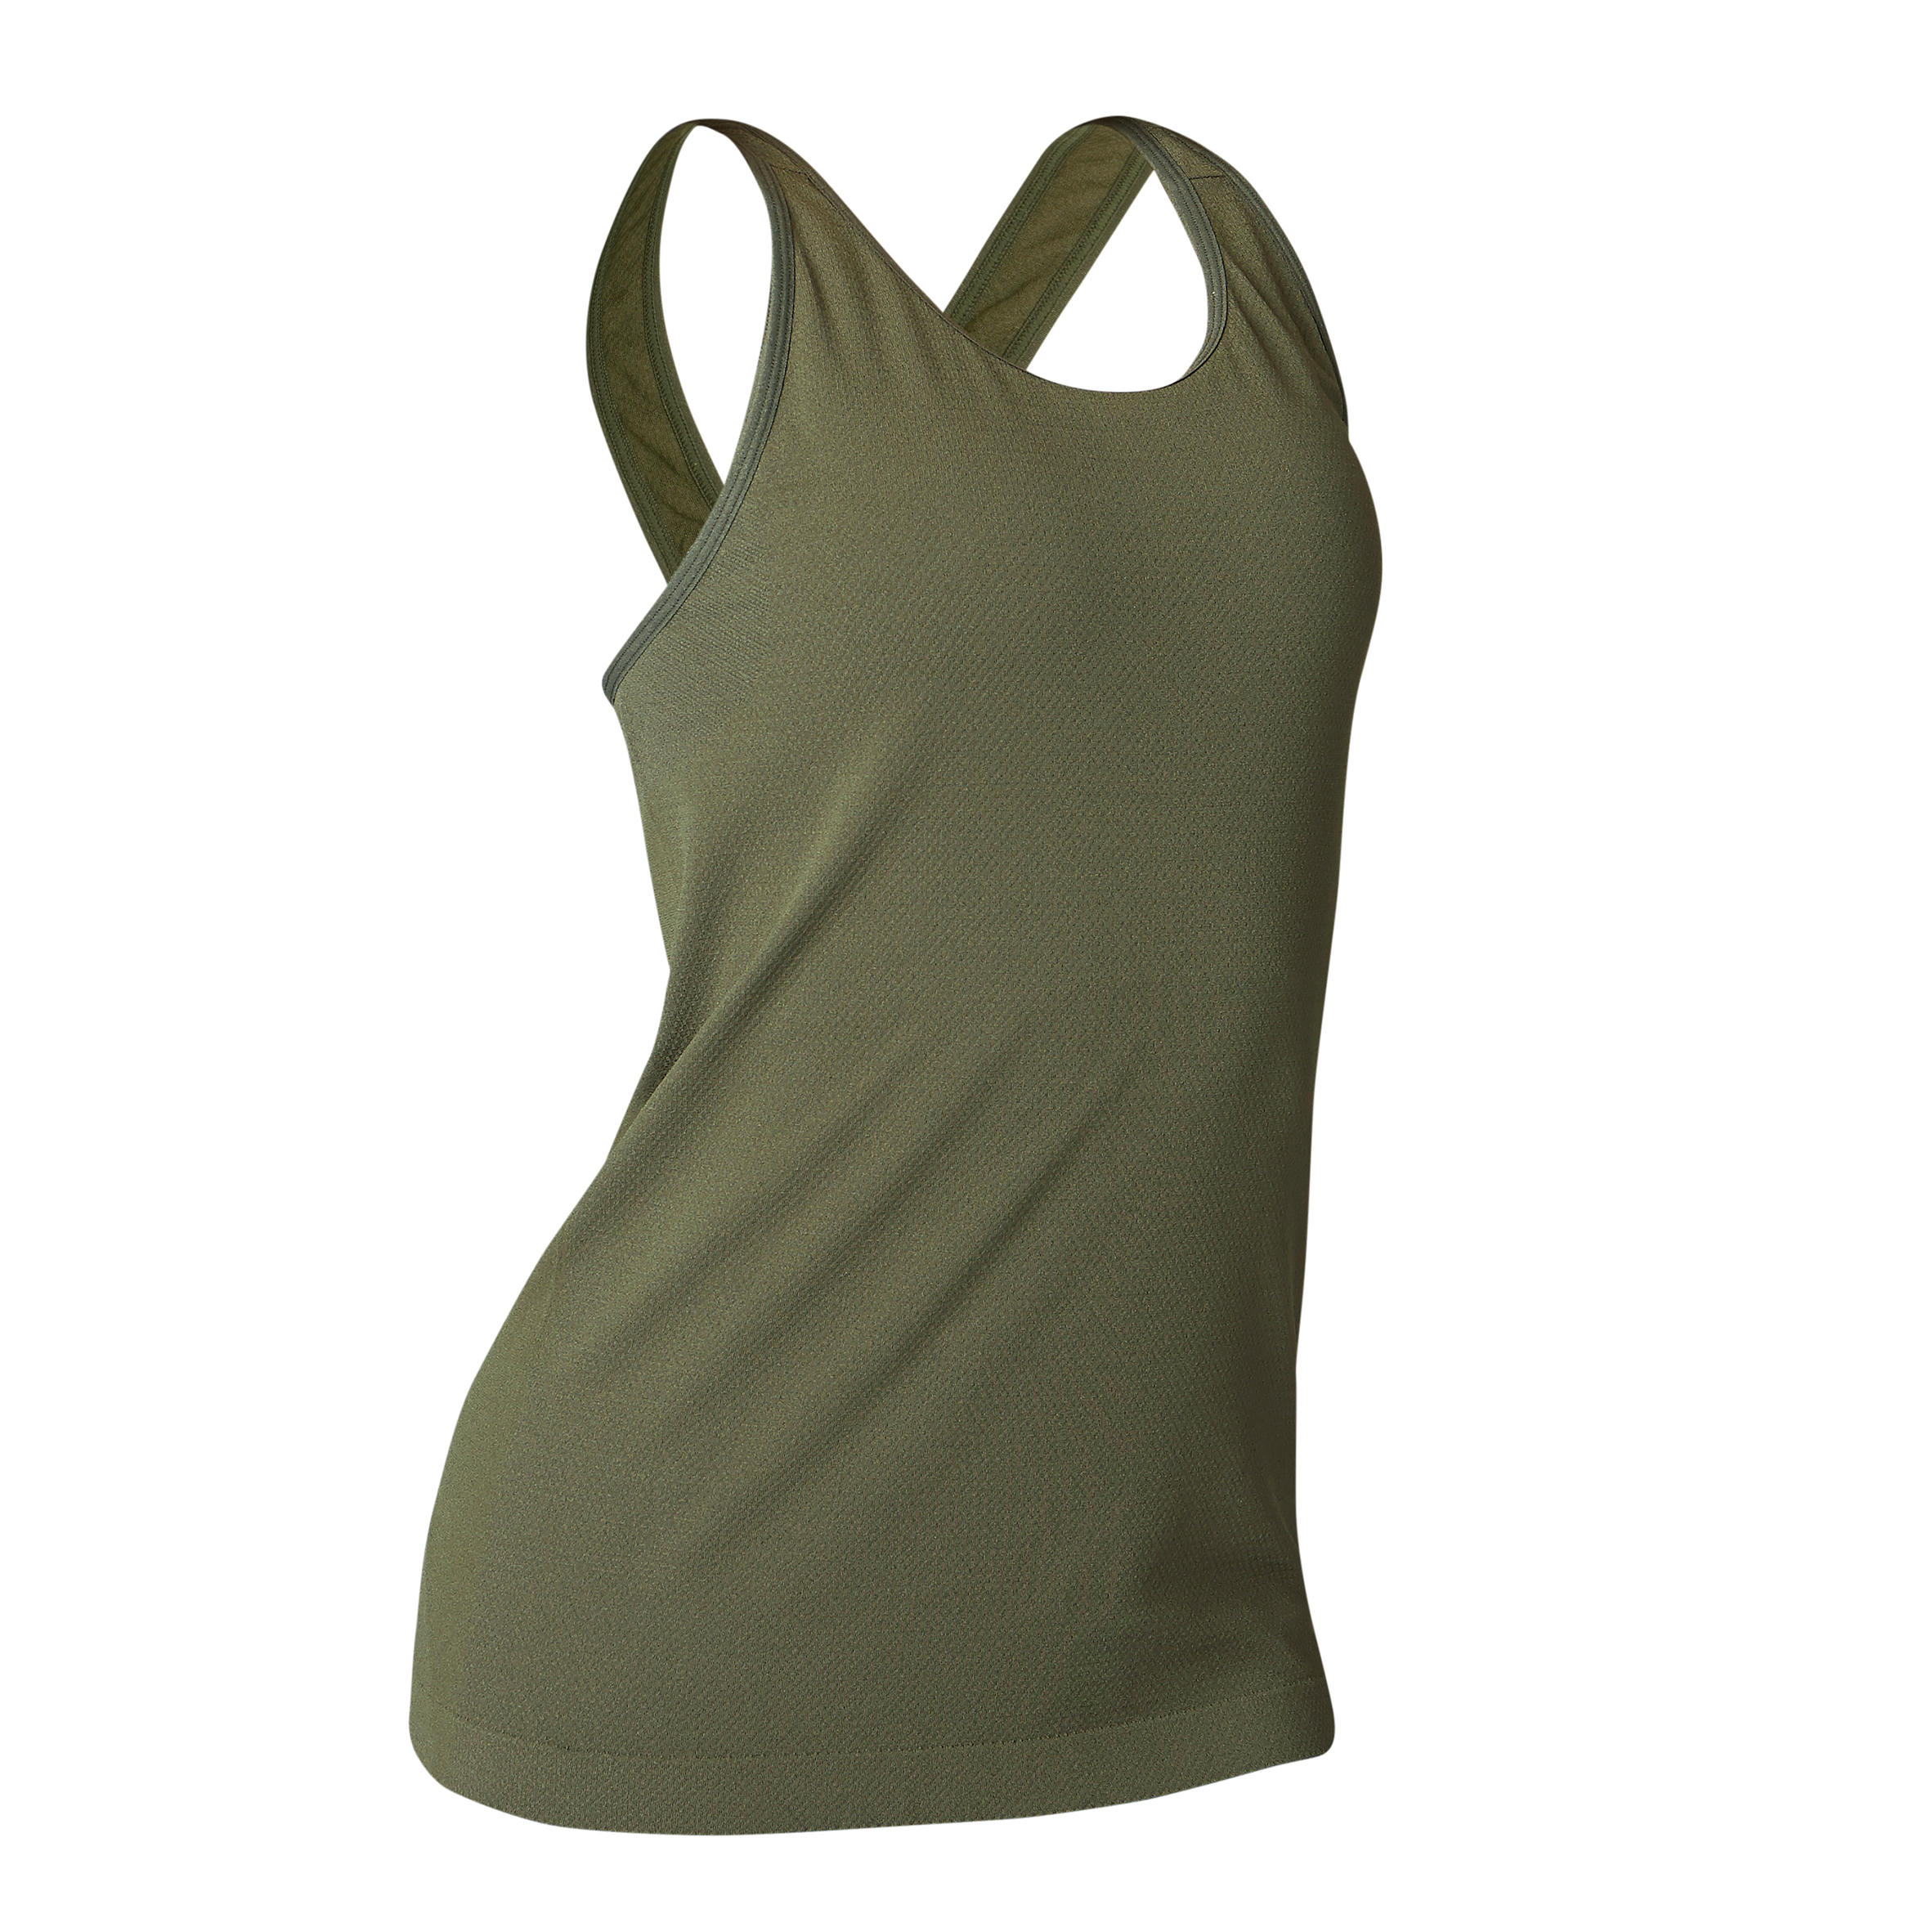 Playera sin mangas y sin costuras Yoga mujer caqui